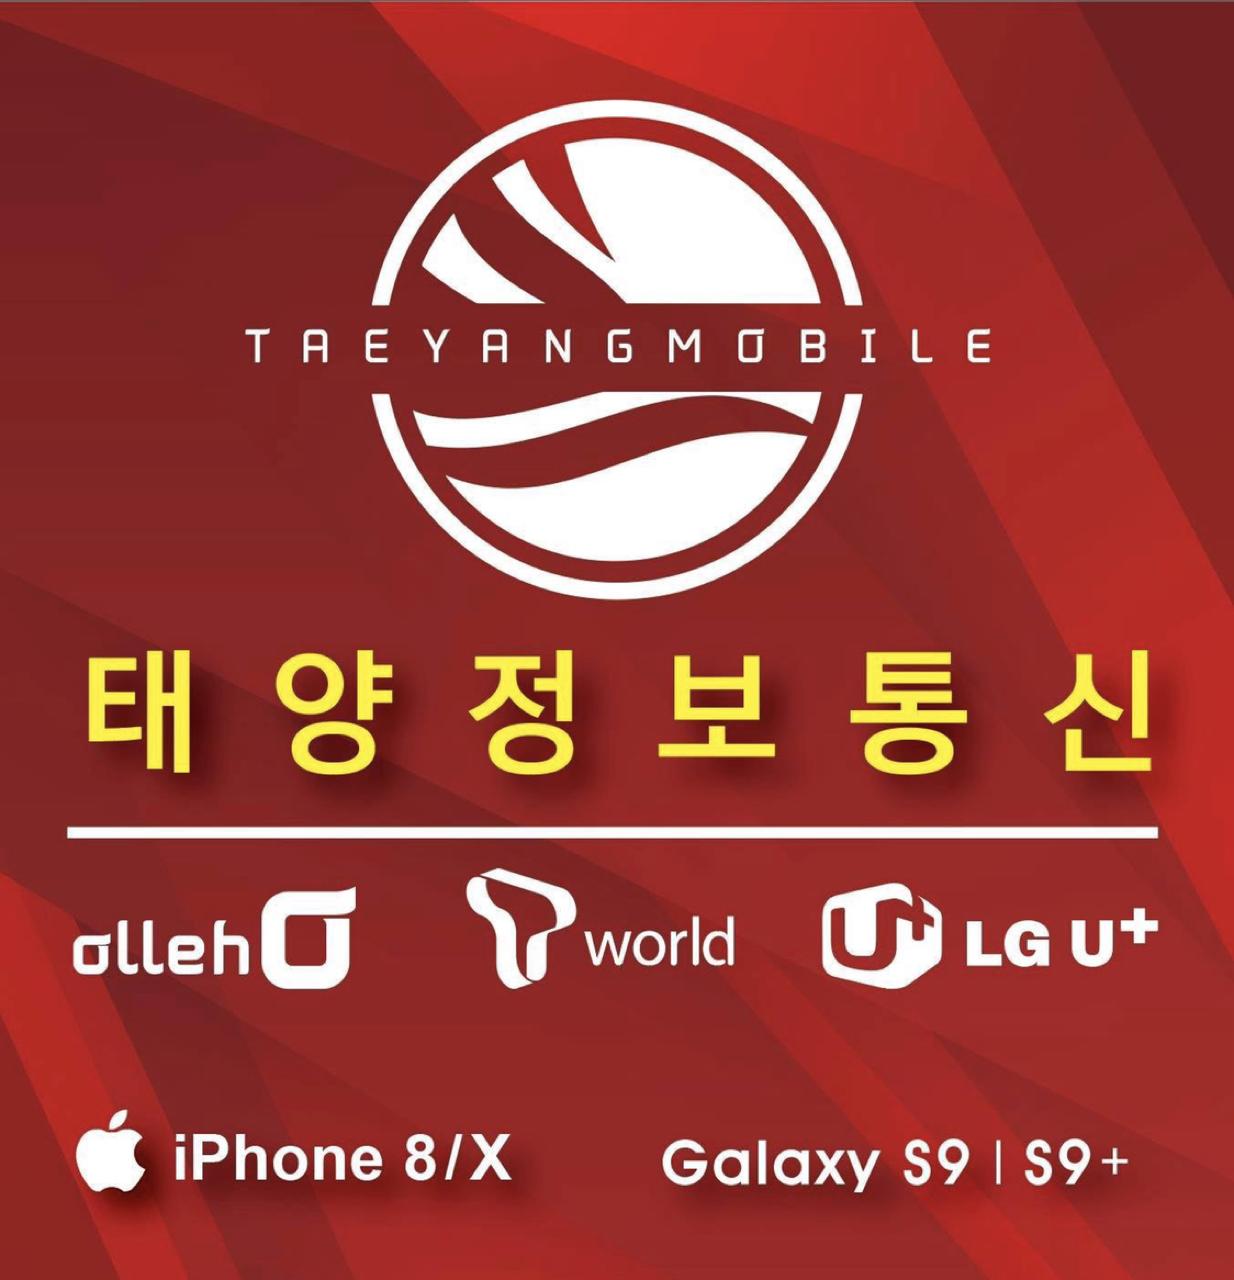 5G갤럭시S10초특가🥇SK/KT/LG 휴대폰,인터넷,캡스 설치! 도내 최저가매장!💰🏆